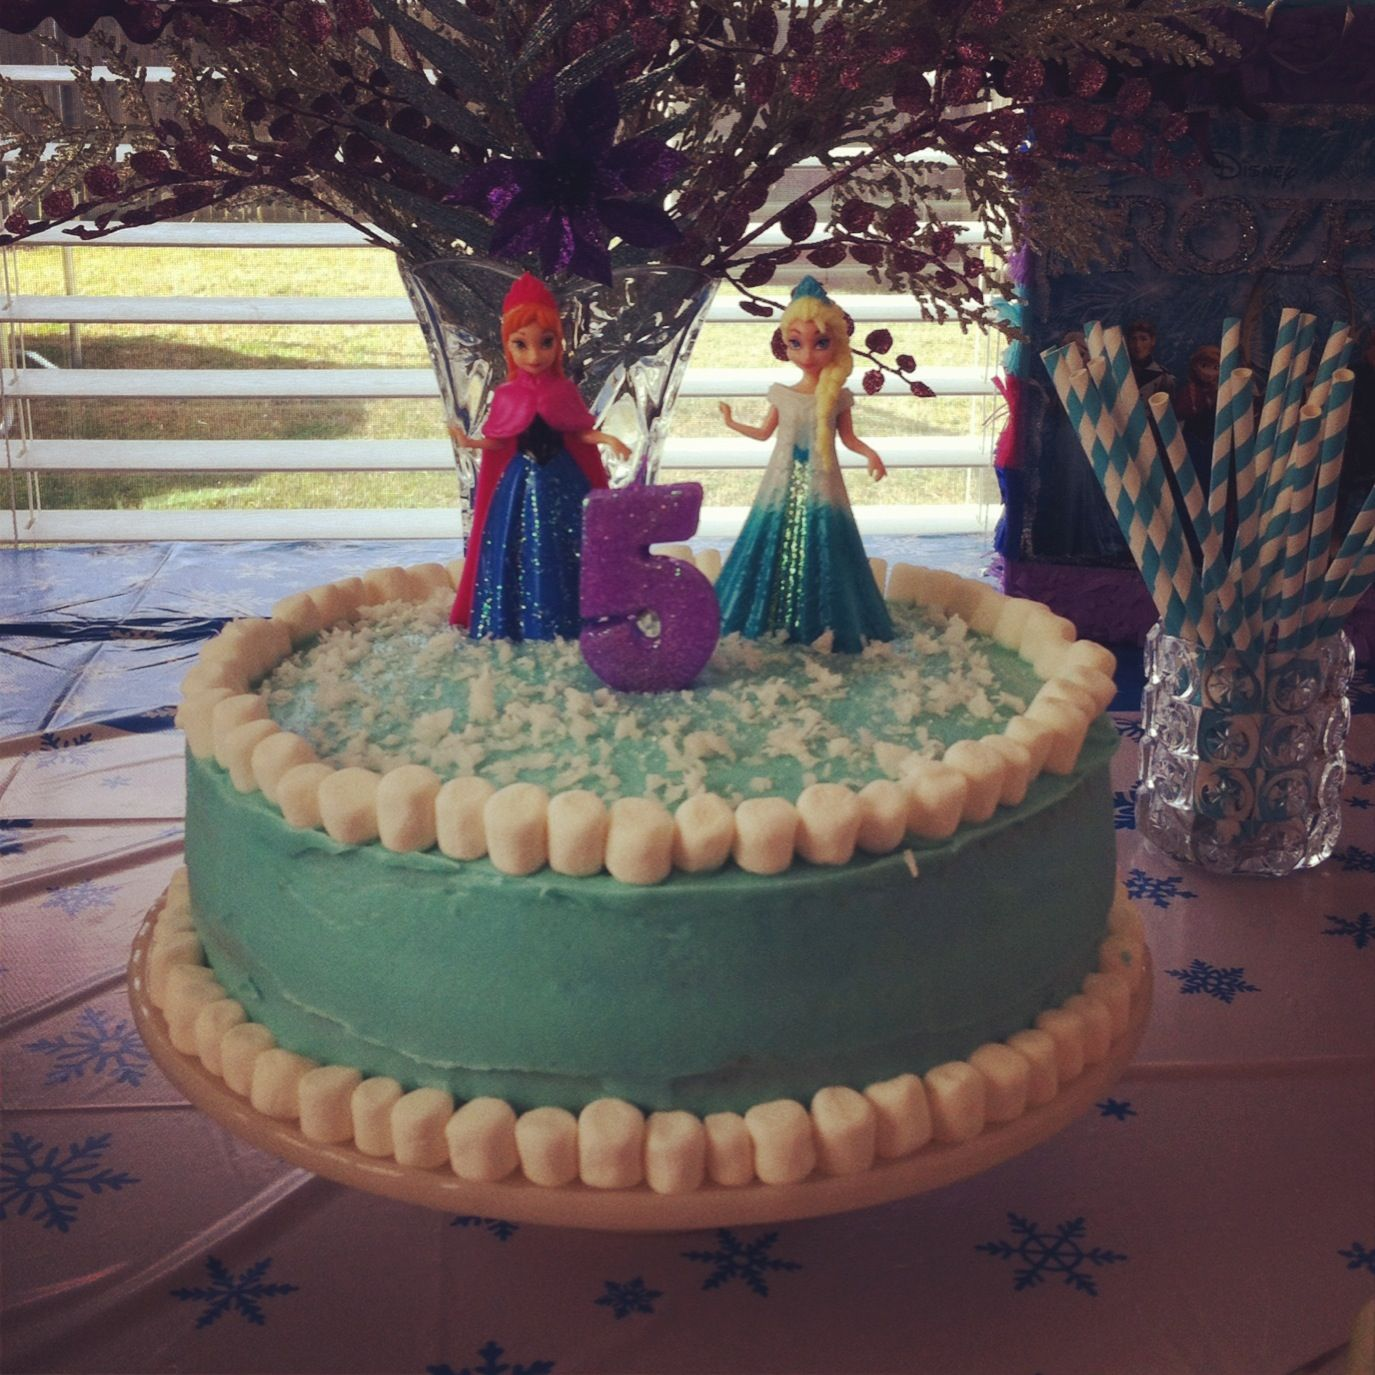 Diy Frozen Cake Betty Crocker Cake Mix Cream Cheese Frosting - Betty crocker birthday cake